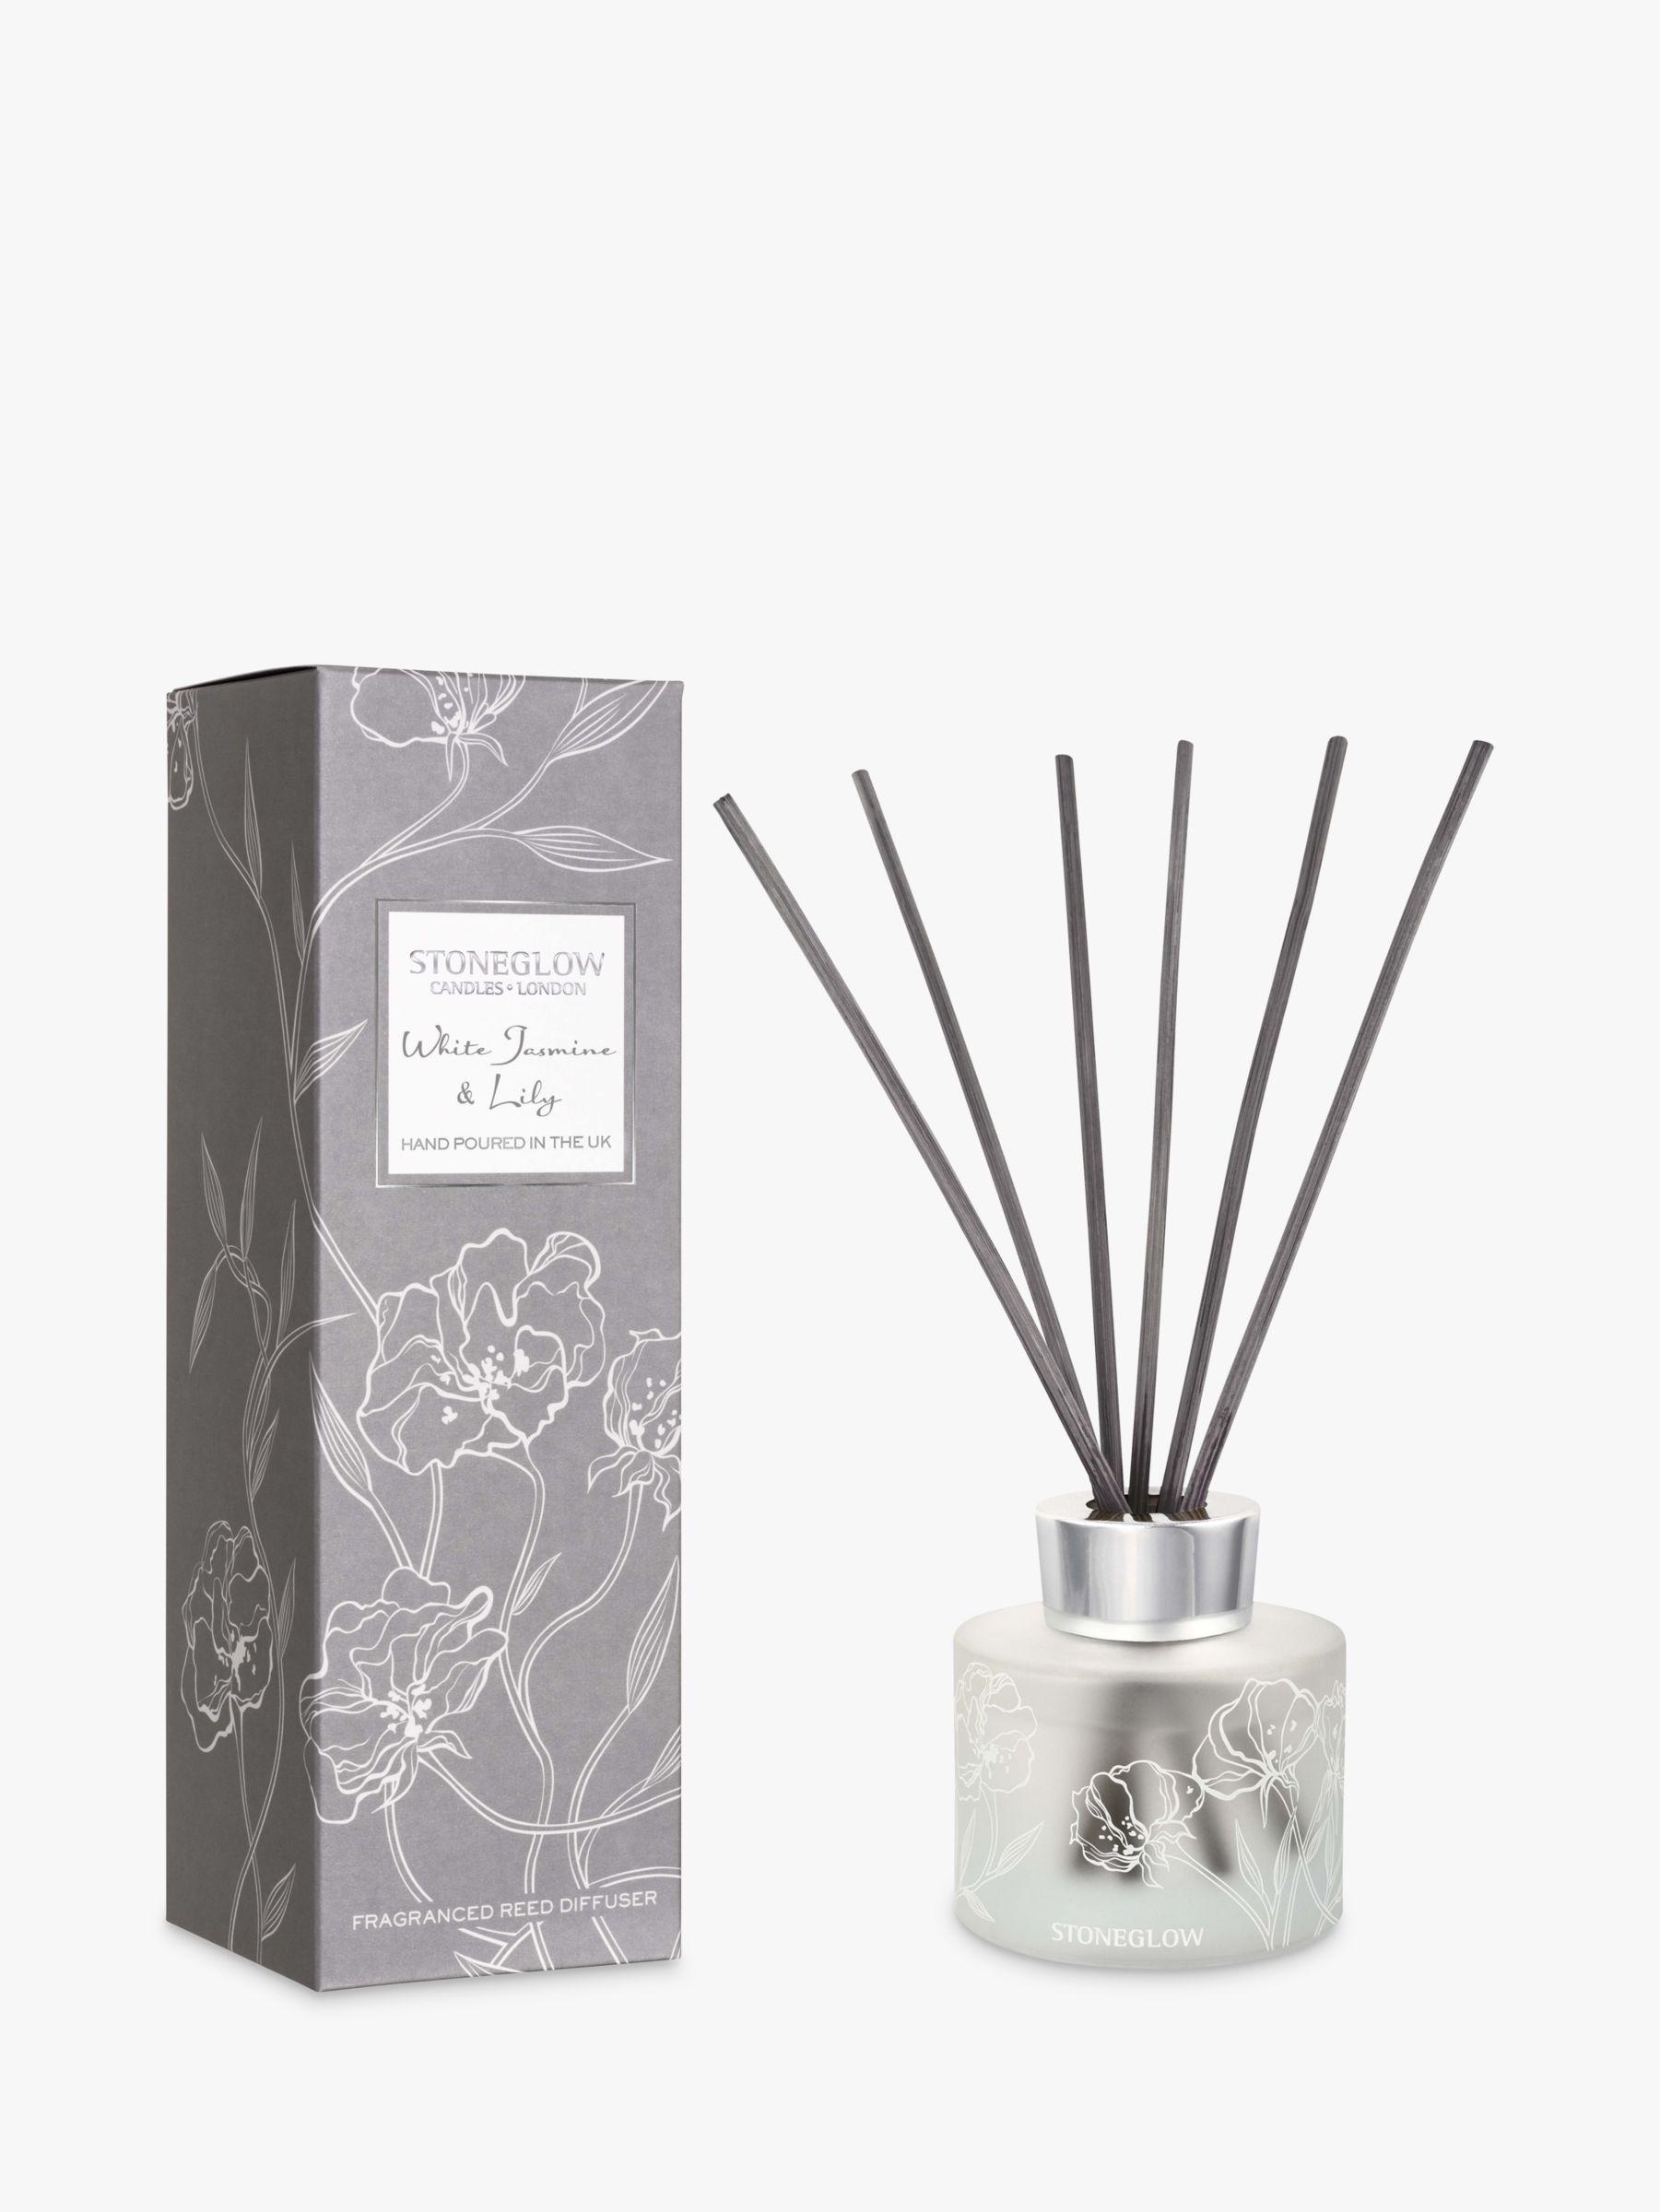 Stoneglow Stoneglow Day Flower White Jasmine & Lily Reed Diffuser, 120ml